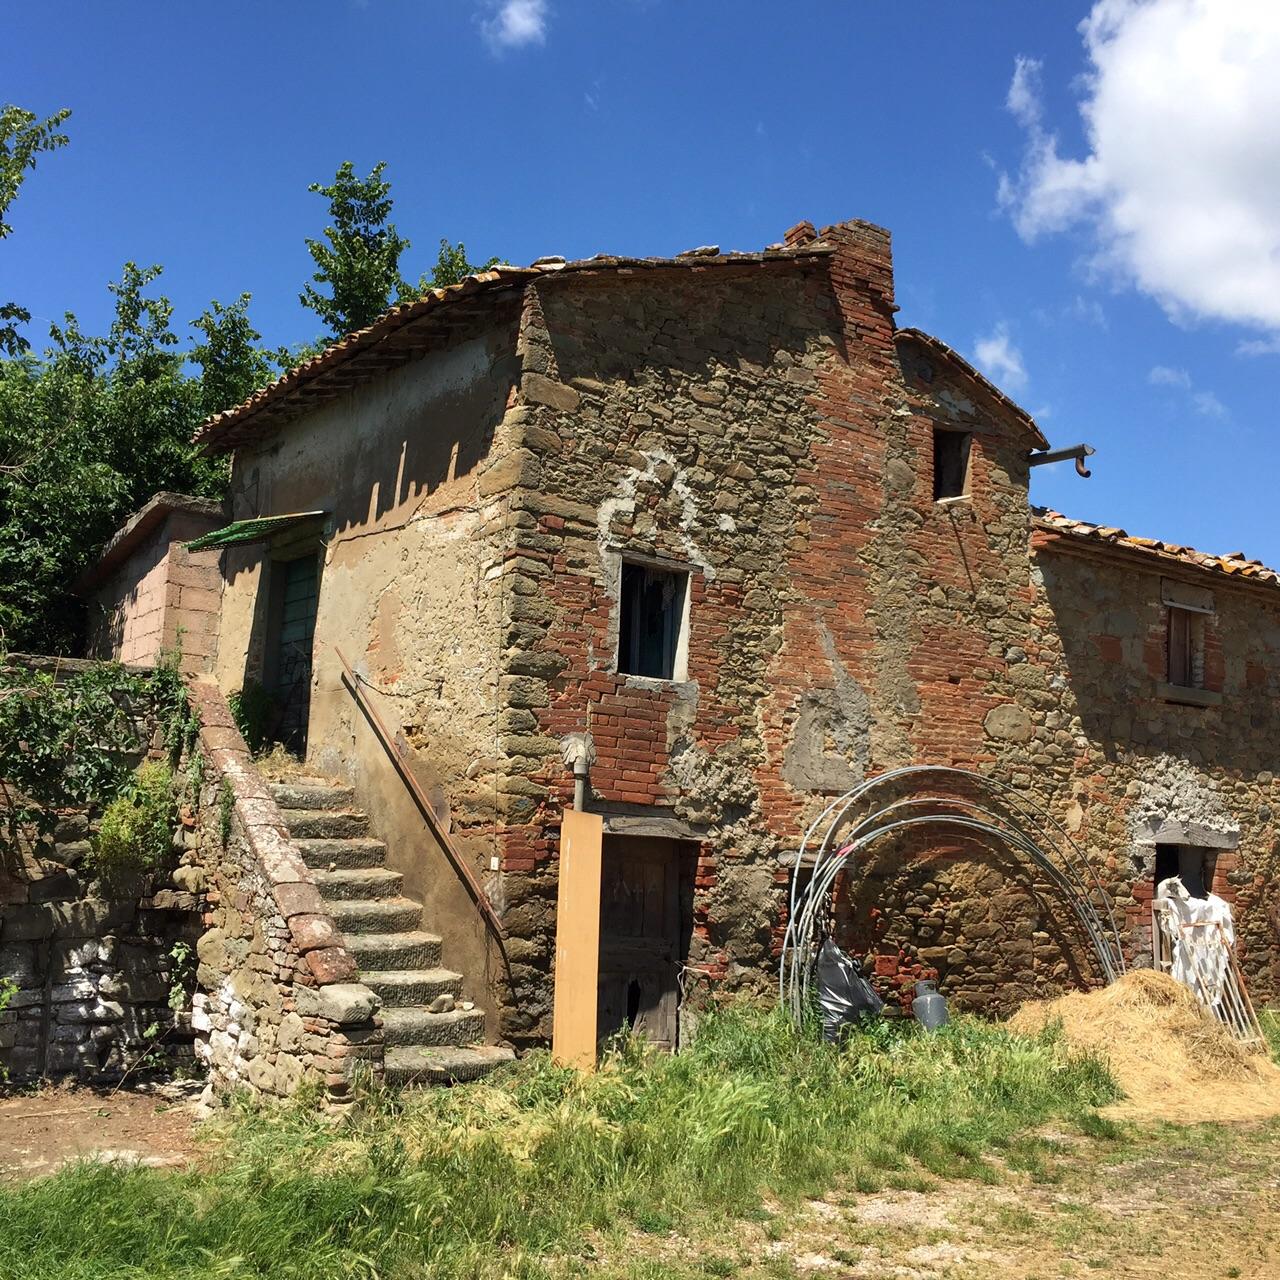 Casali e rustici archives bellafante immobiliare bellafante immobiliare - Ristrutturare casale in pietra ...